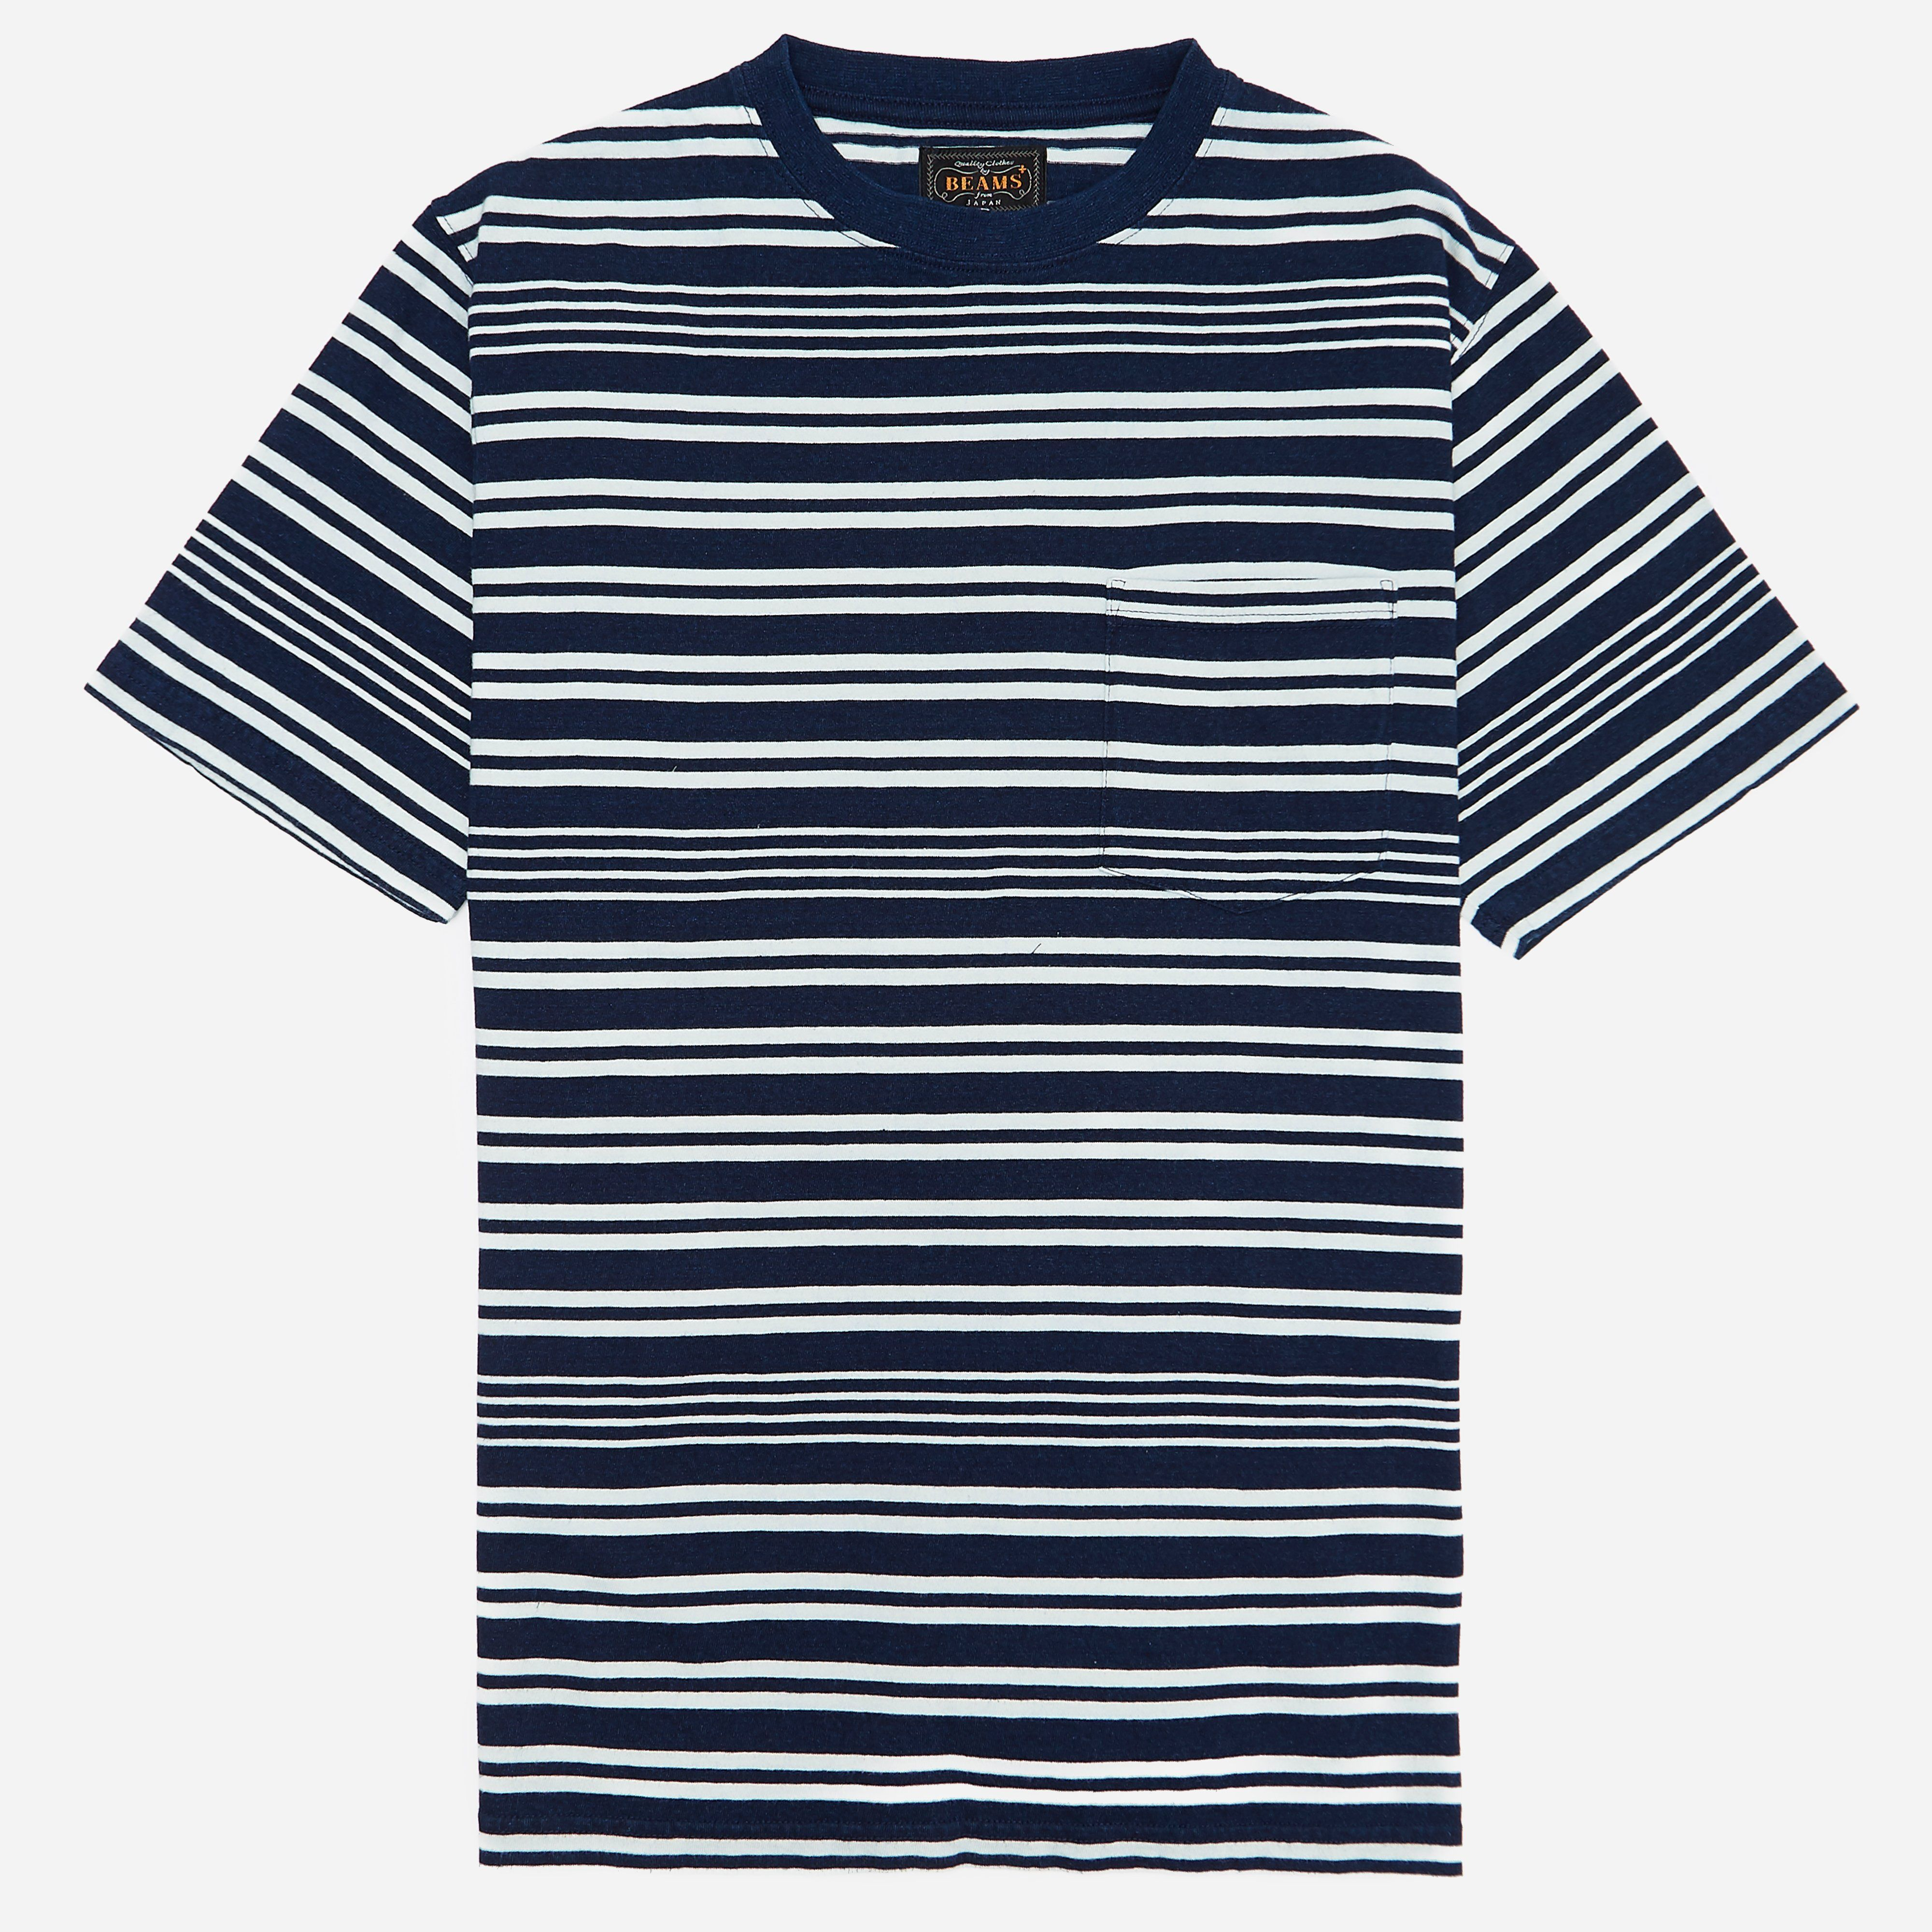 Beams Plus Indigo Border Pocket T-shirt